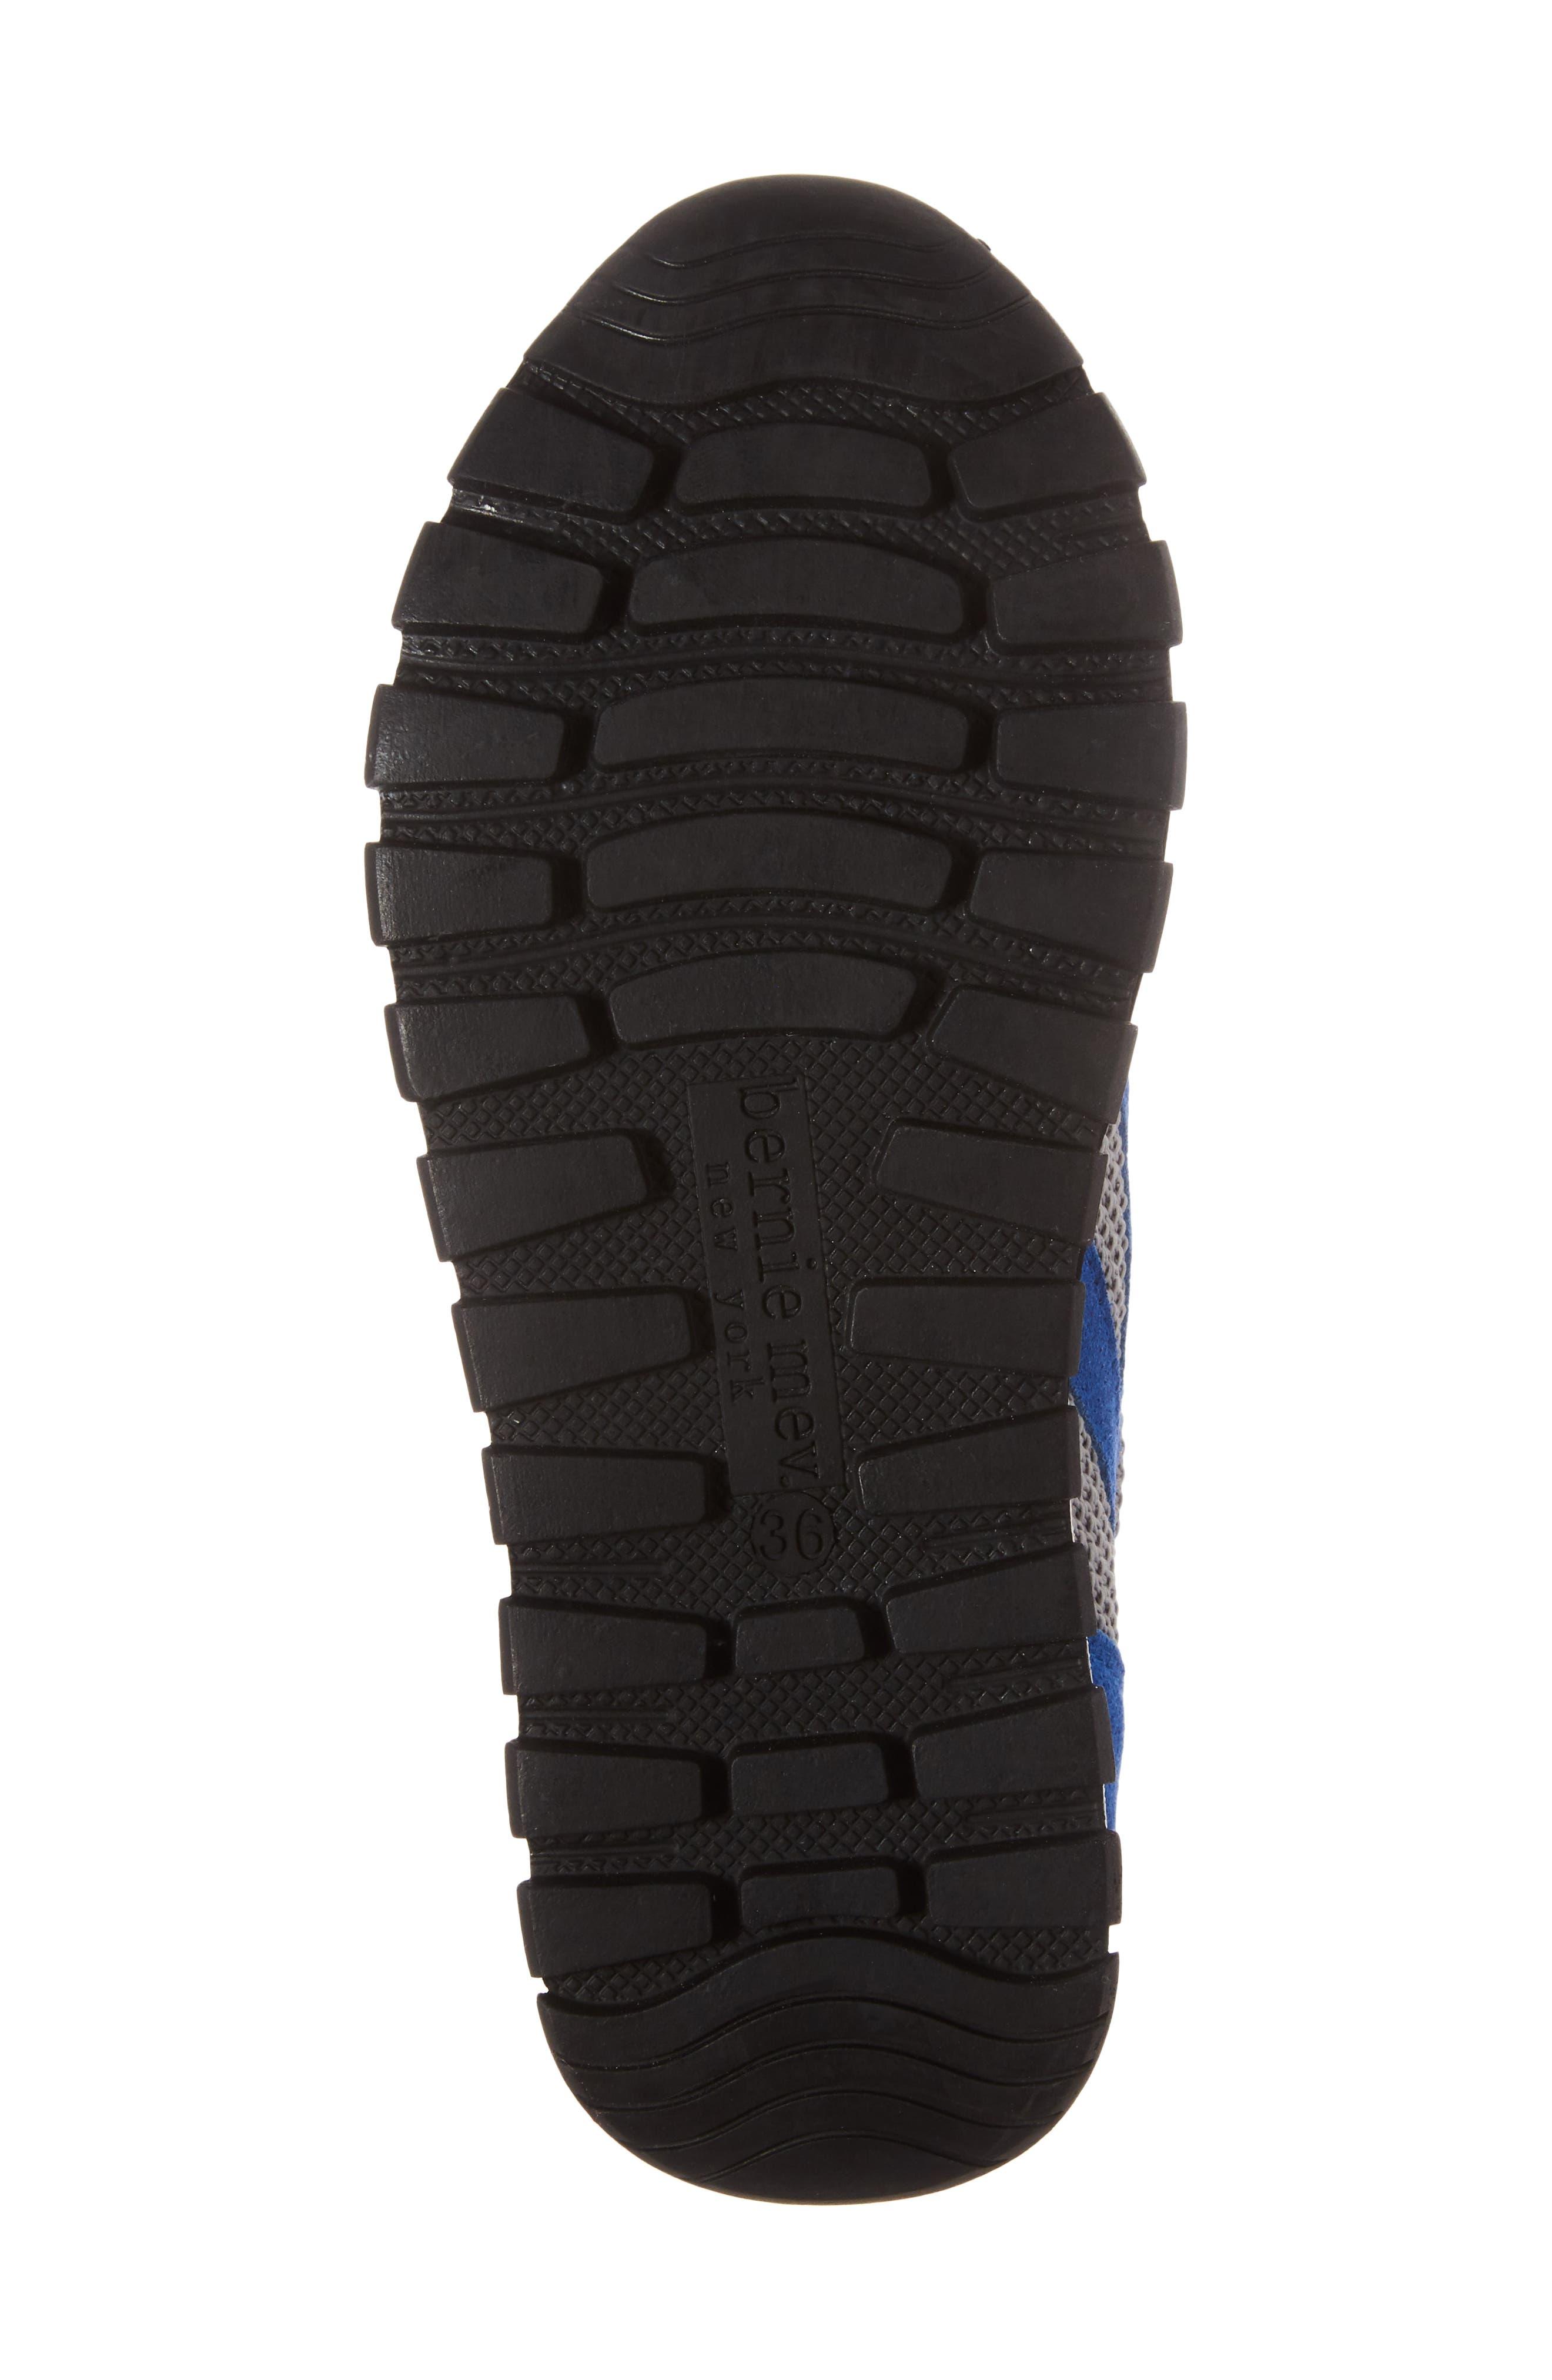 Bernie Mev Tara Cano Sneaker,                             Alternate thumbnail 6, color,                             ROYAL BLUE/ GREY FABRIC